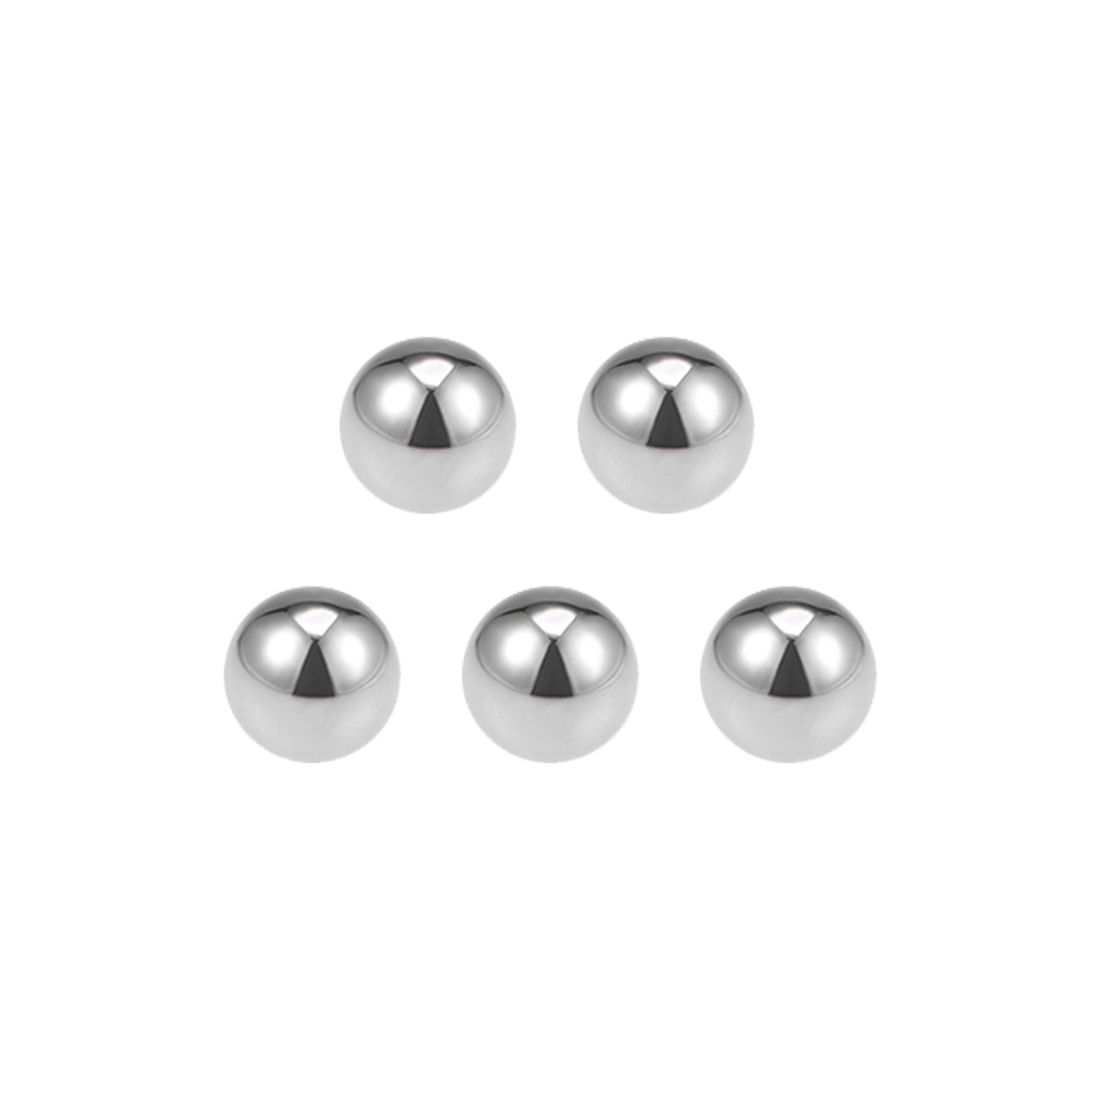 1mm Bearing Balls Tungsten Carbide G25 Precision Balls 10pcs